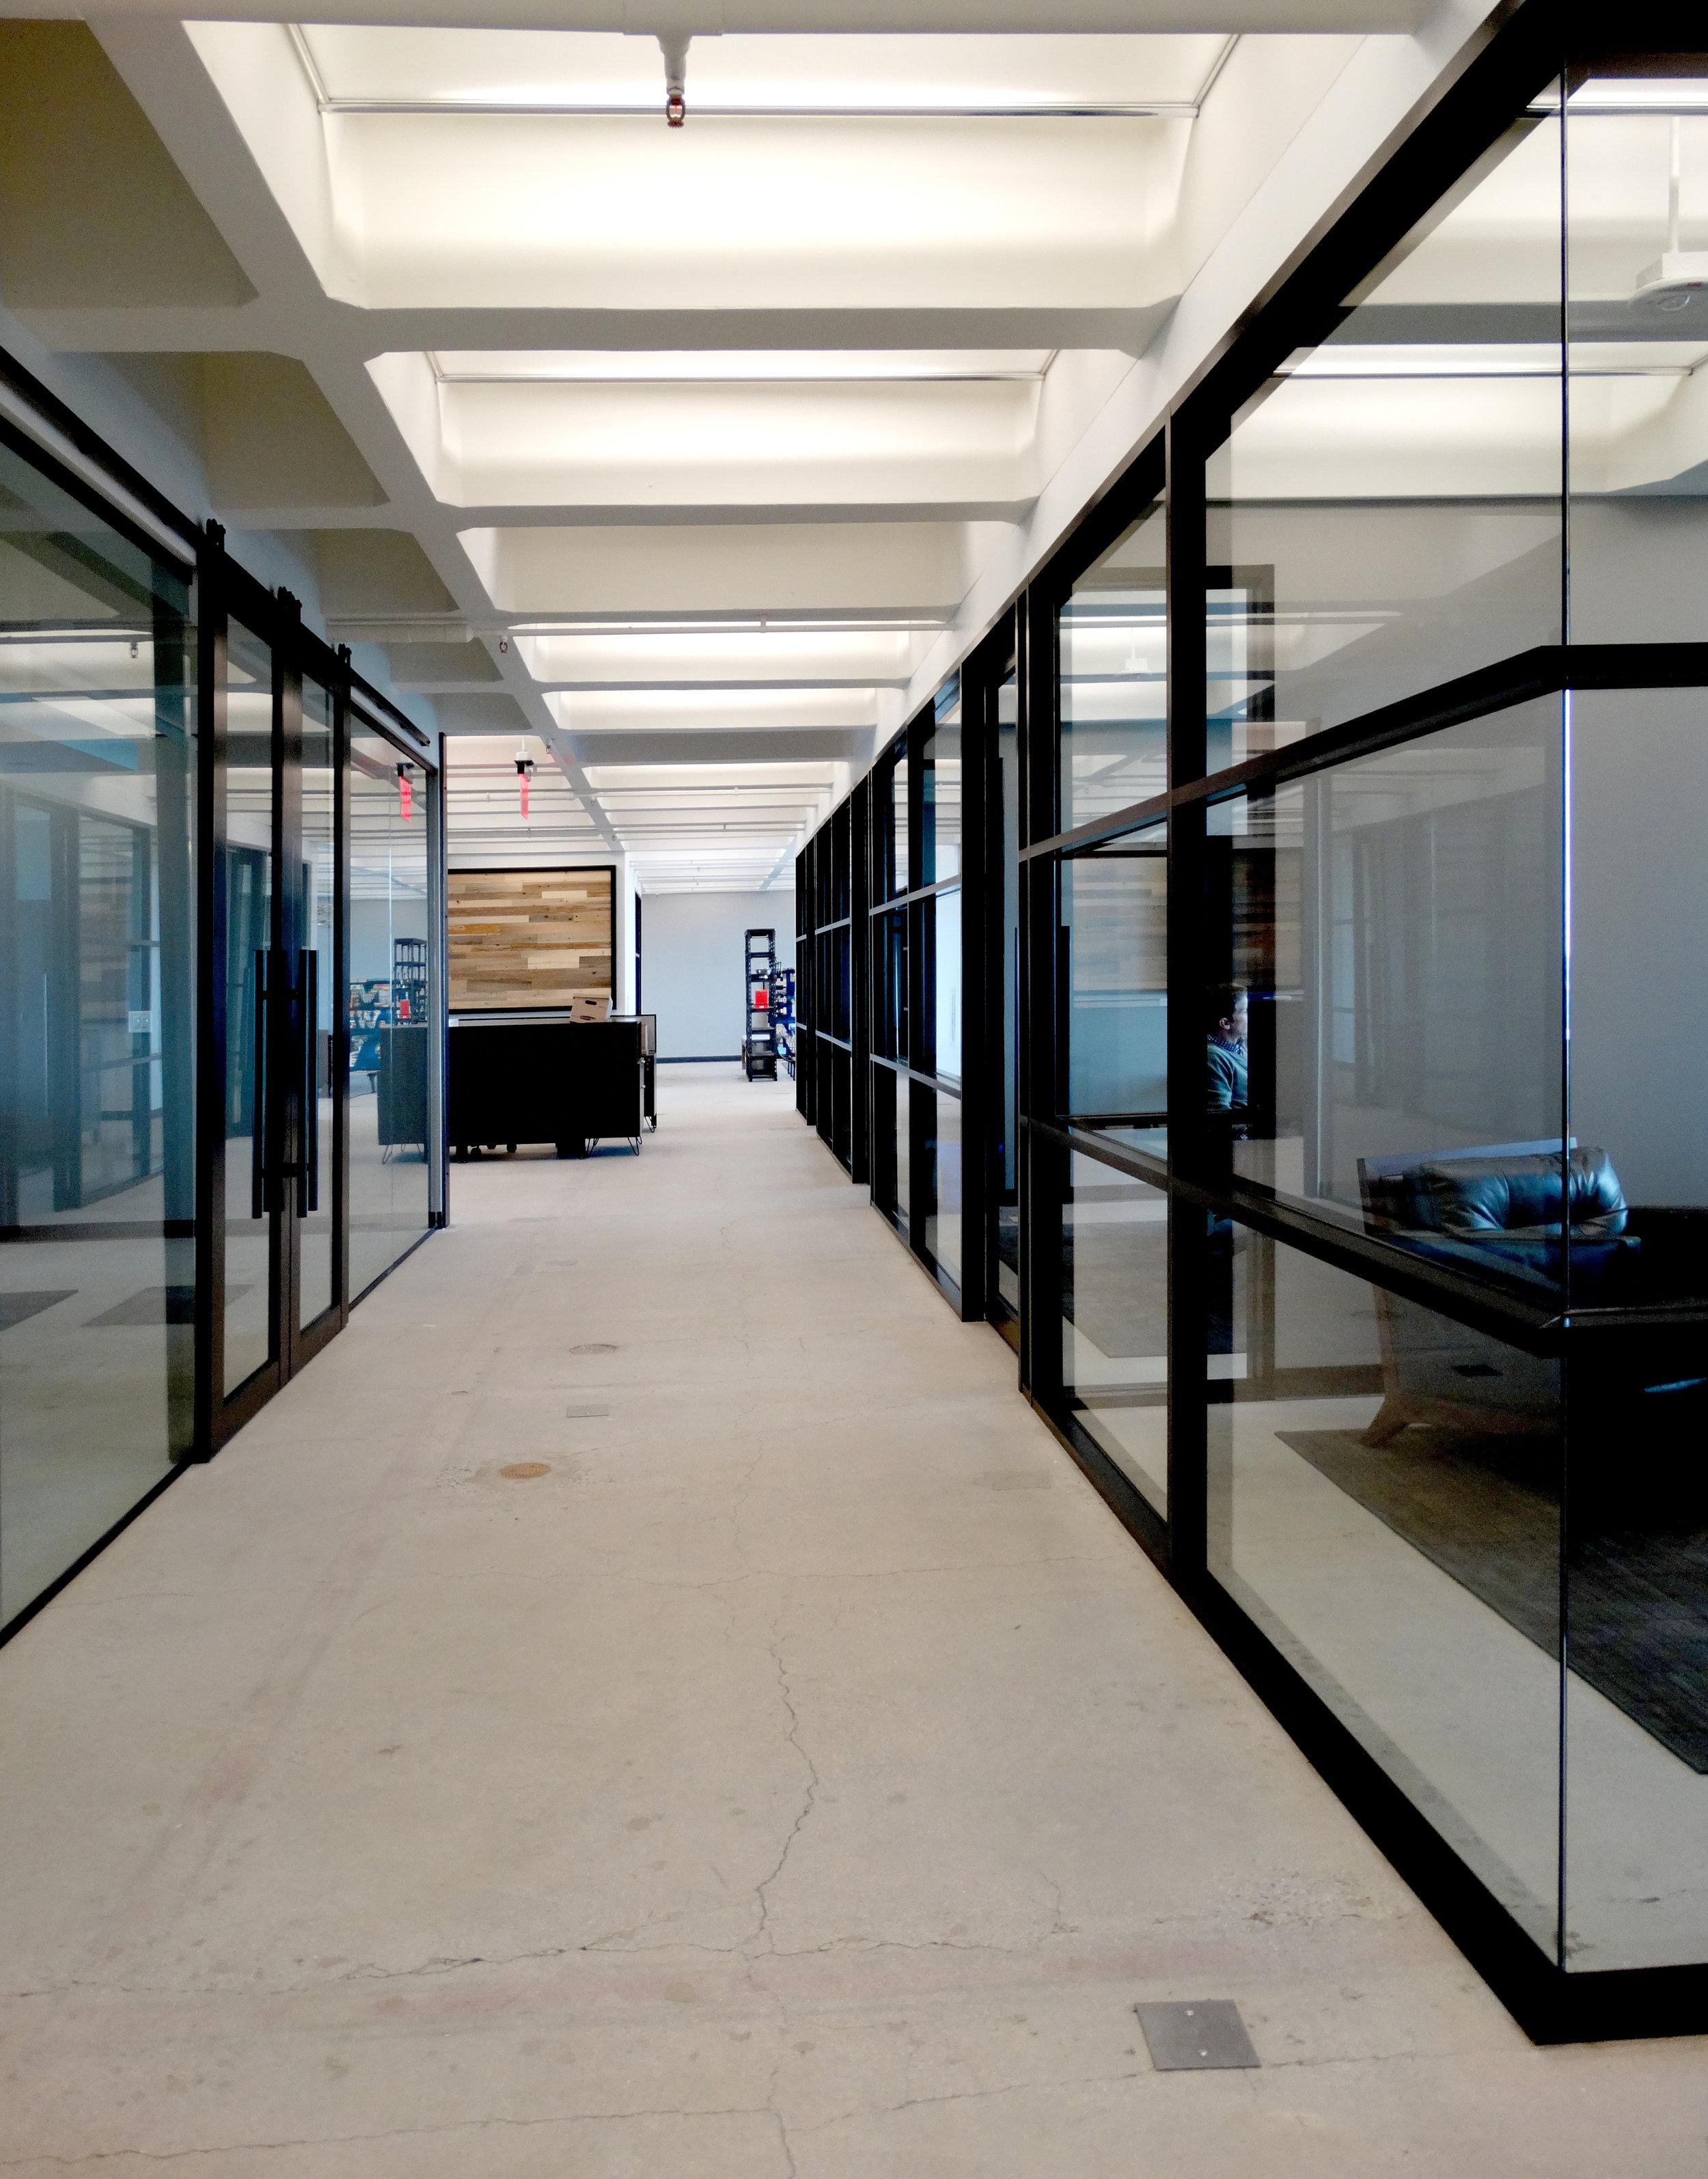 Encase Black Barn Door Bi-Parting Aluminum Framed Door Conference Room Wall - Spaceworks AI.JPG